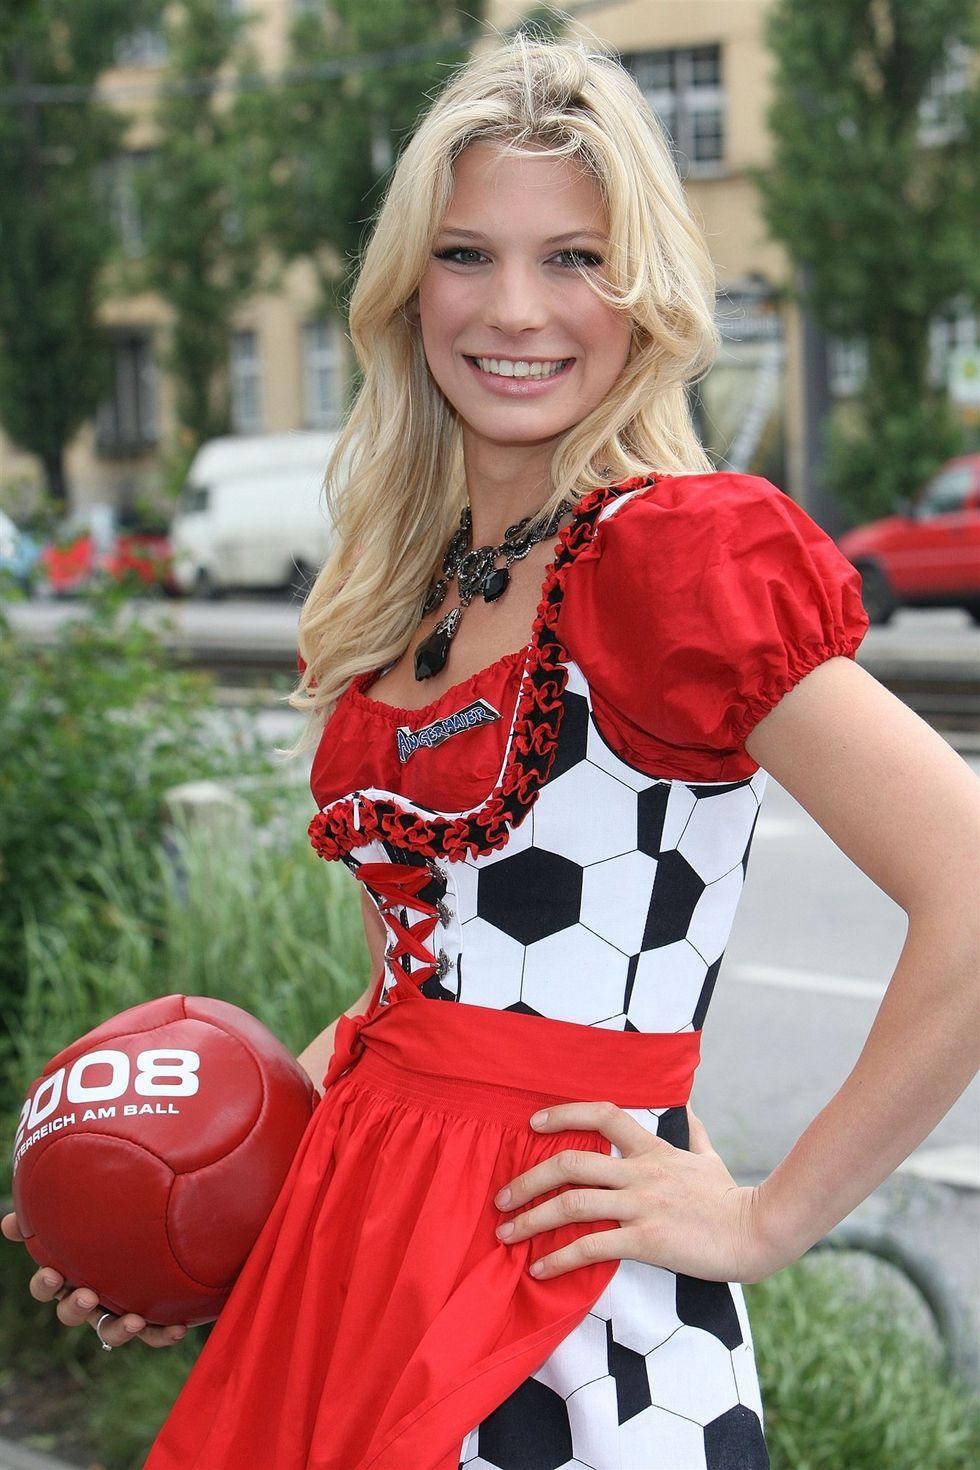 Sarah Brander da sogno, ma Schweinsteiger flirta con Ana Ivanovic